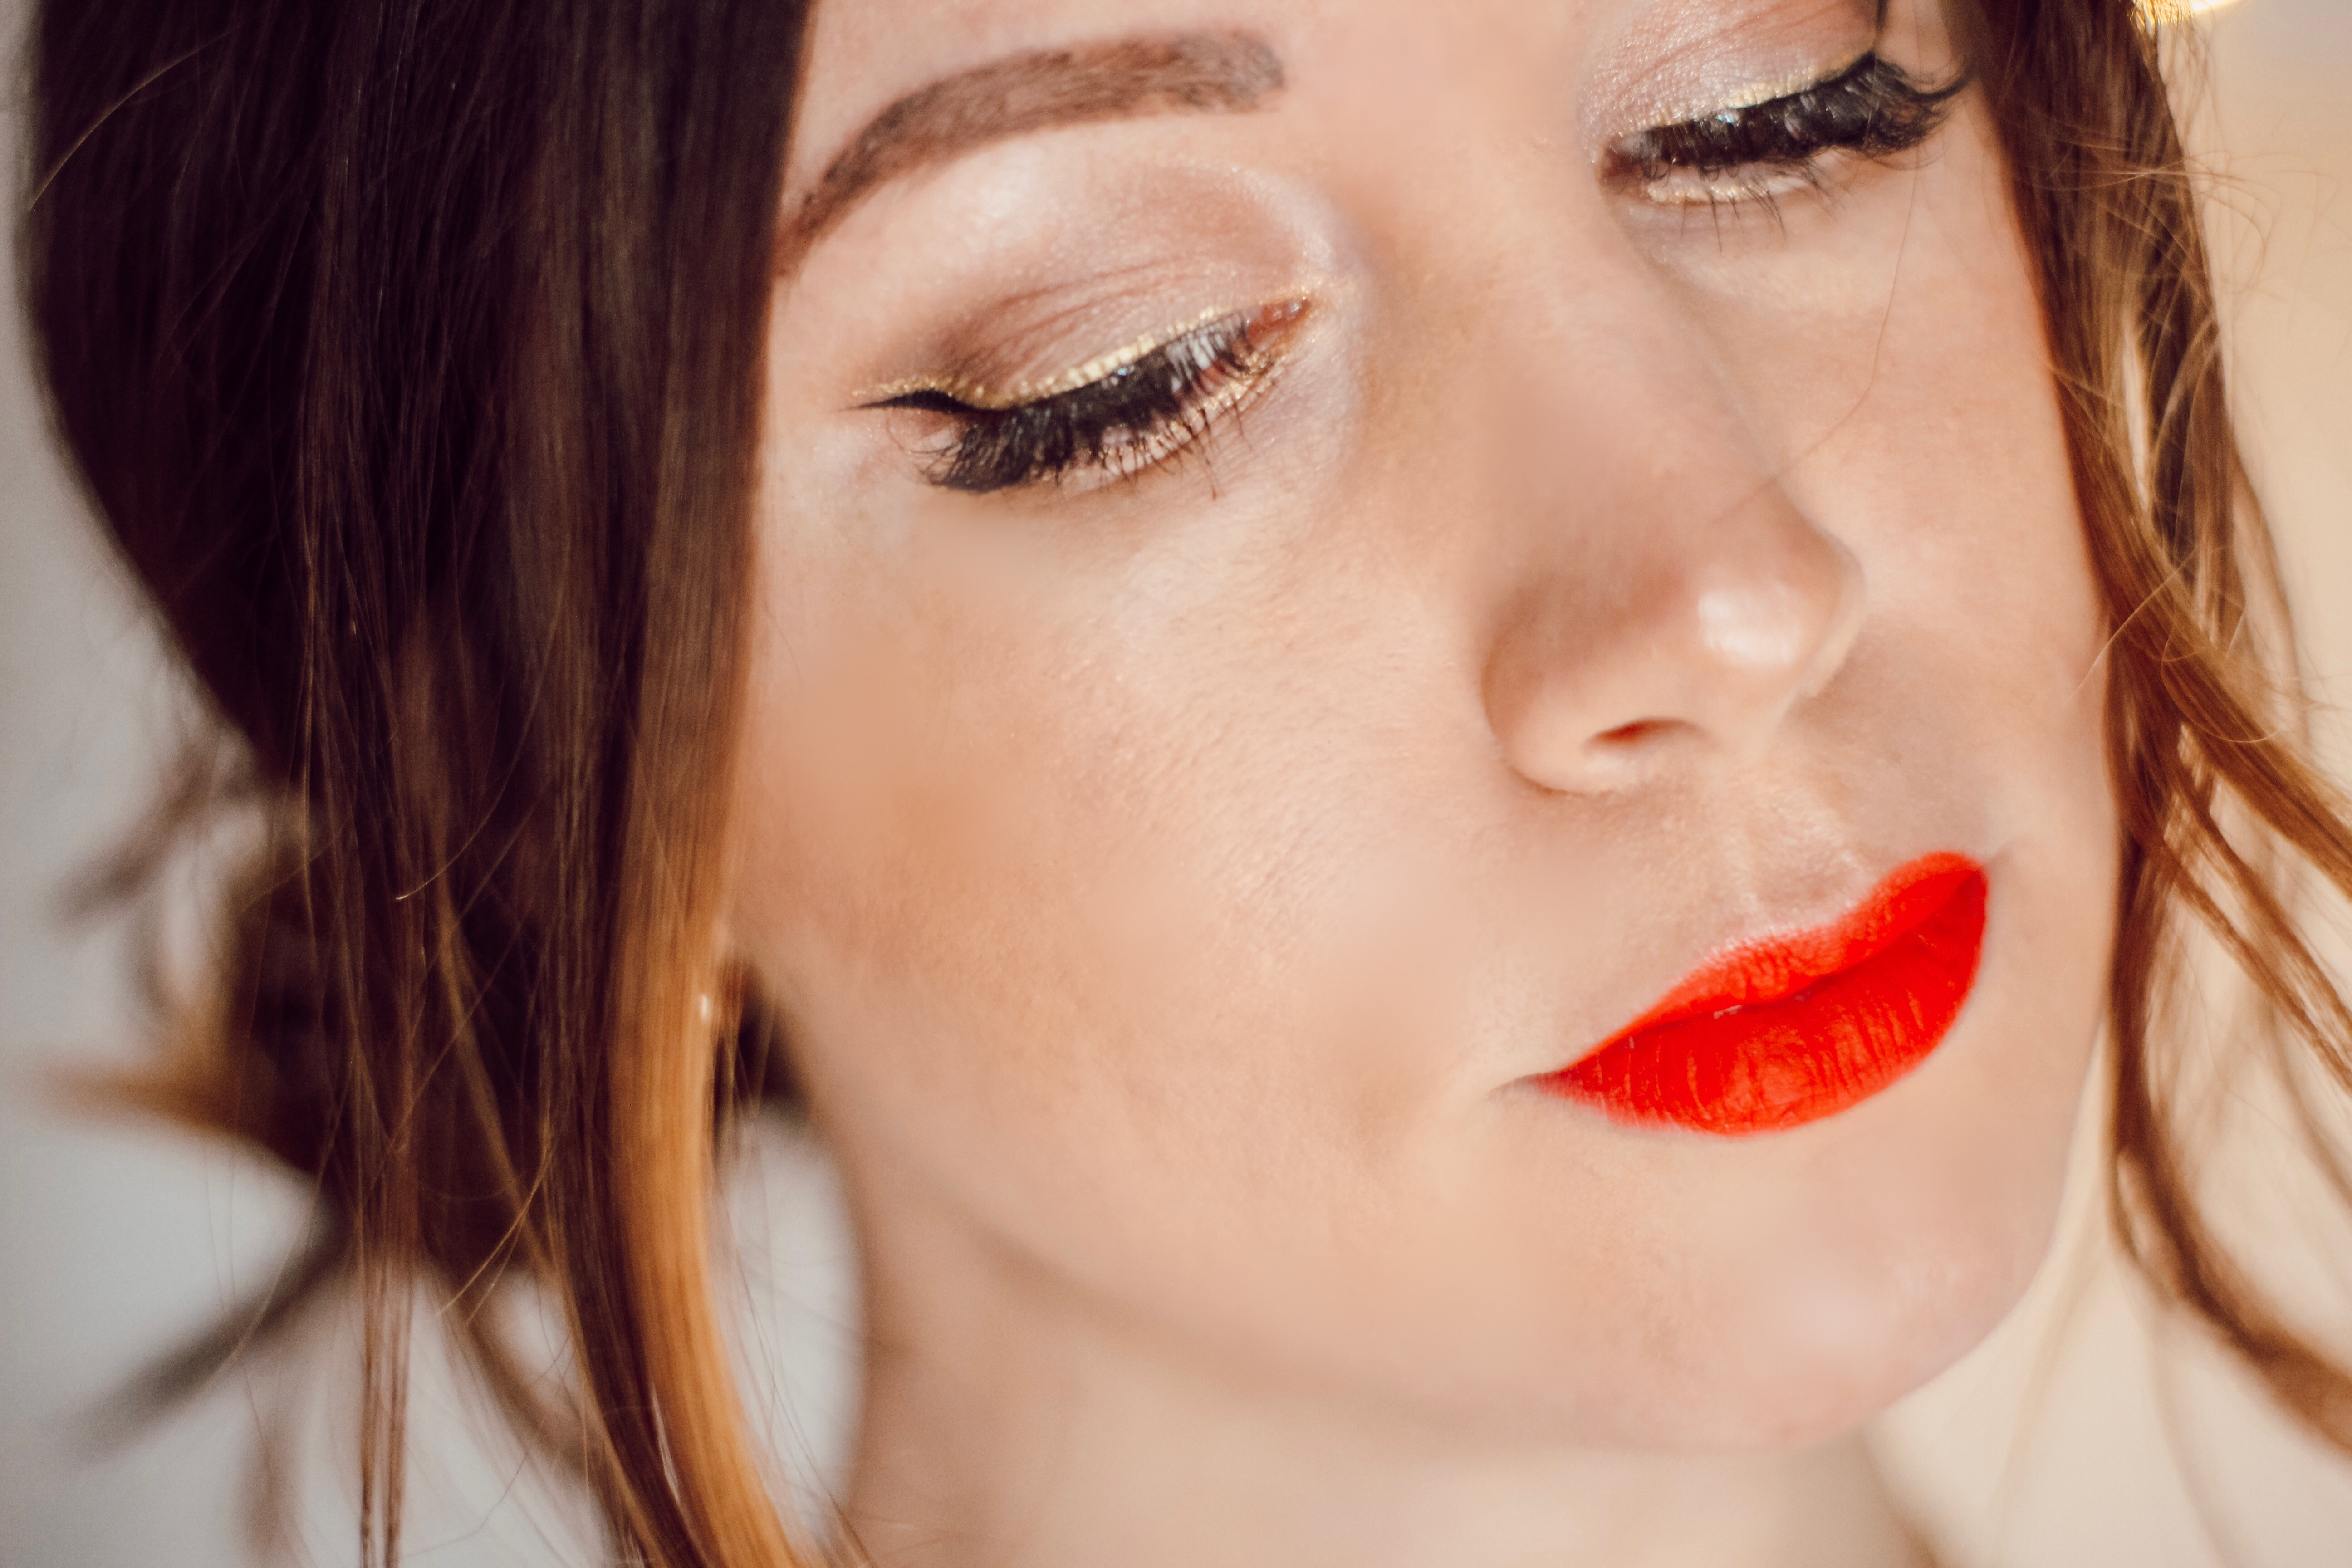 Maquillage des fêtes Yves Rocher bouche rouge